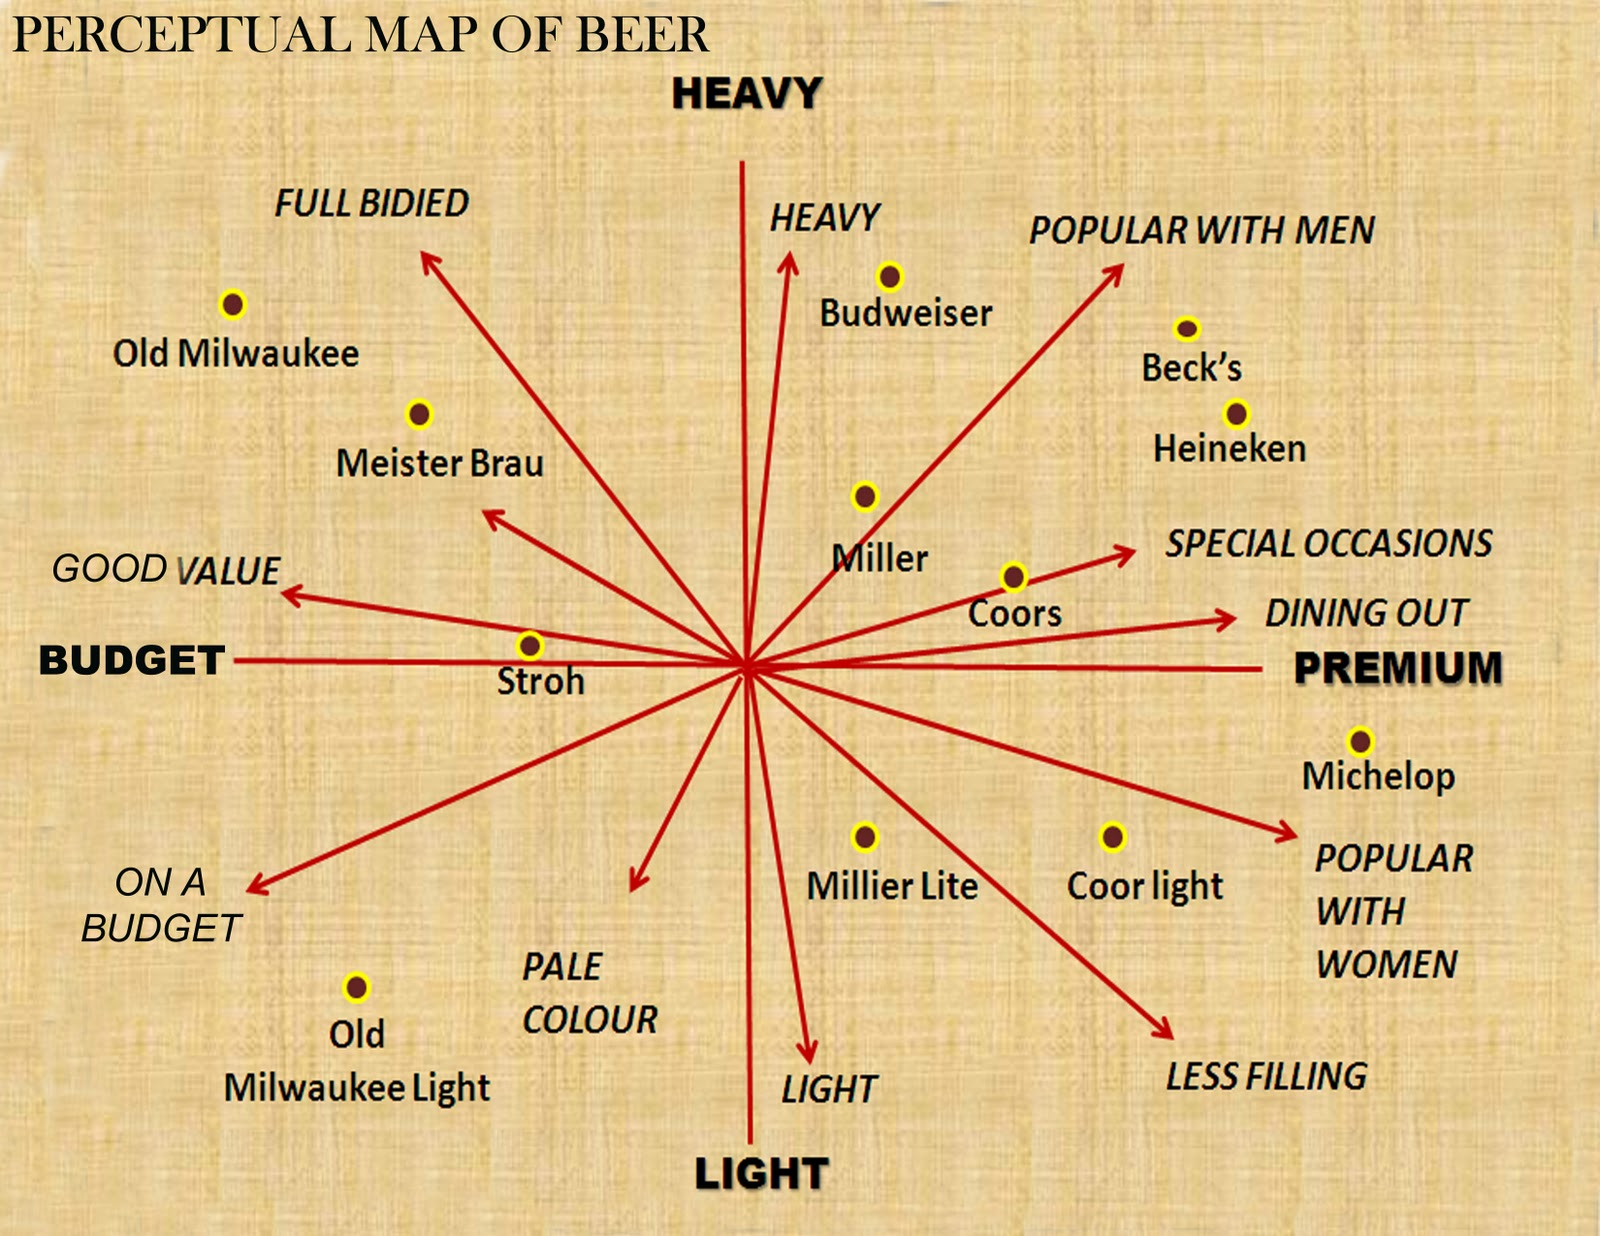 Perceptual map template map tool nice free perceptual map template pictures 7 market map templates perceptual map of beer maxwellsz